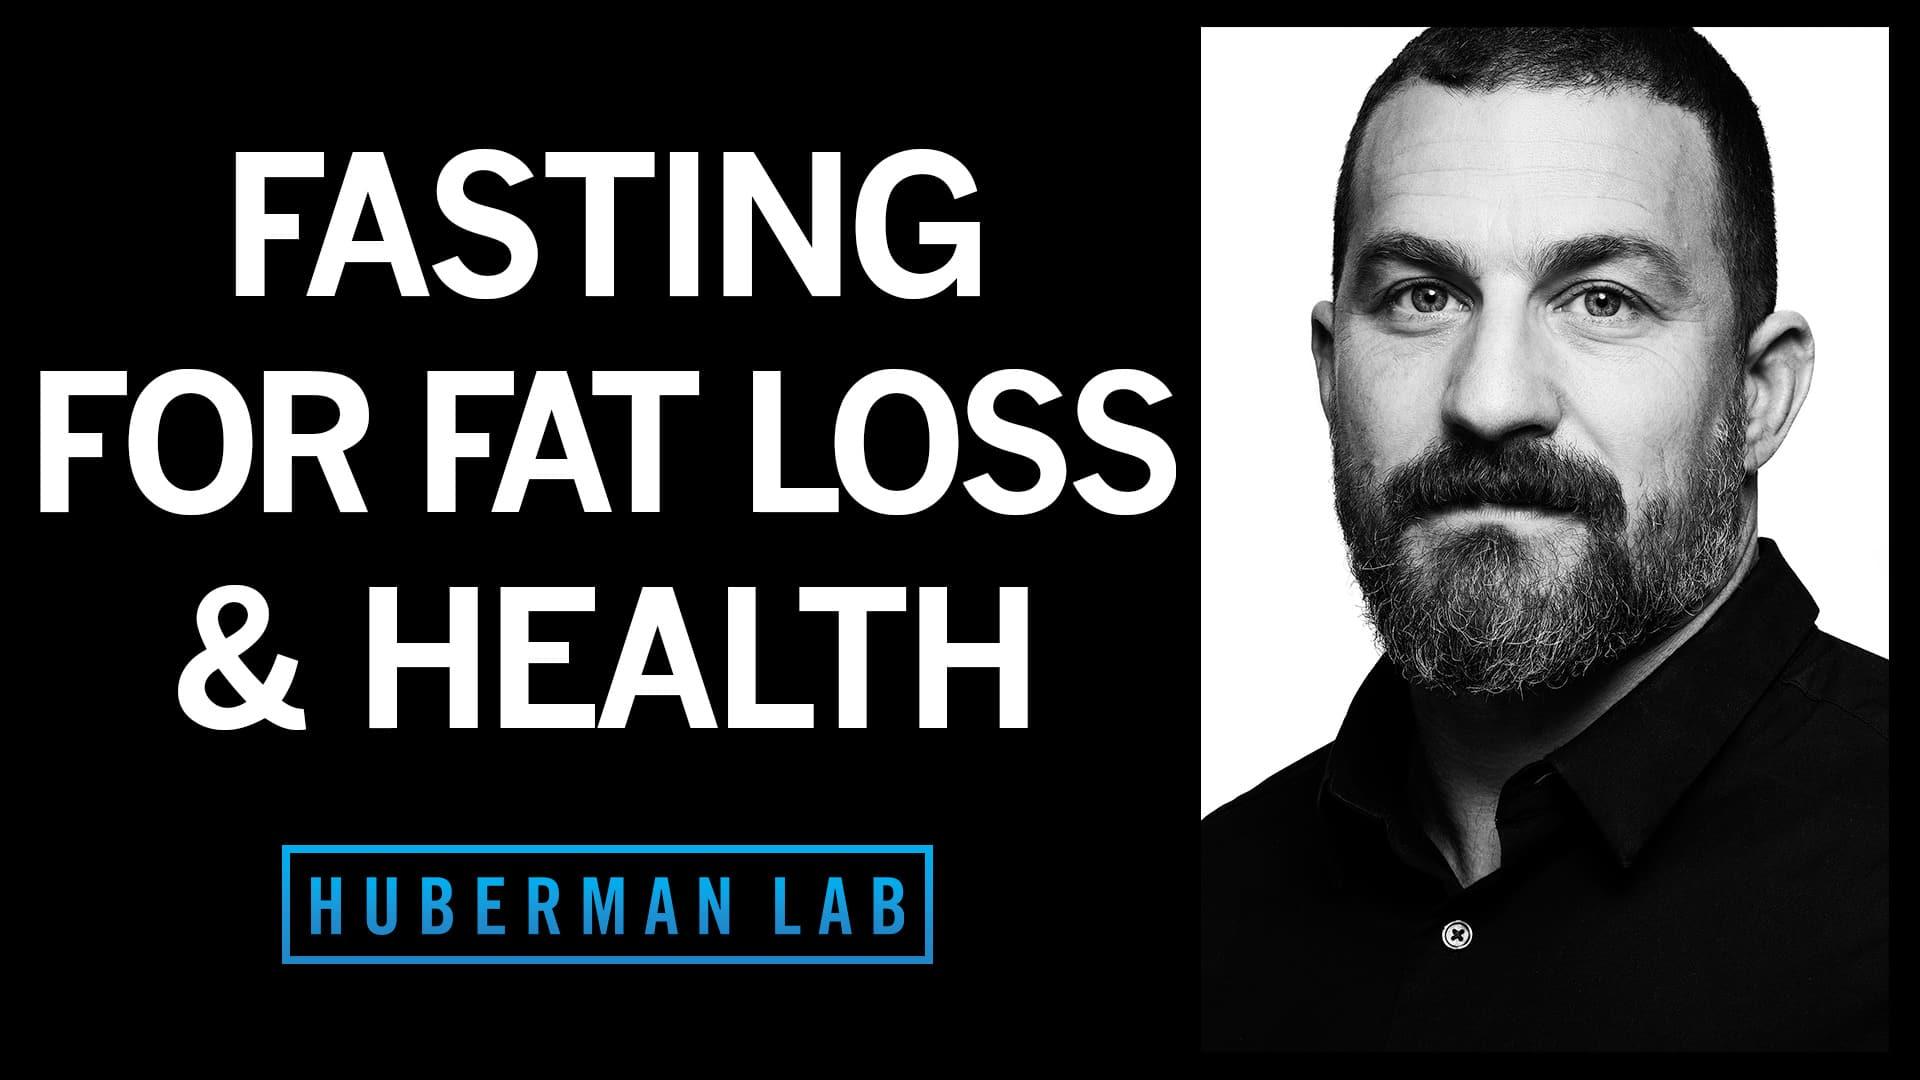 Huberman Lab Podcast Episode 41